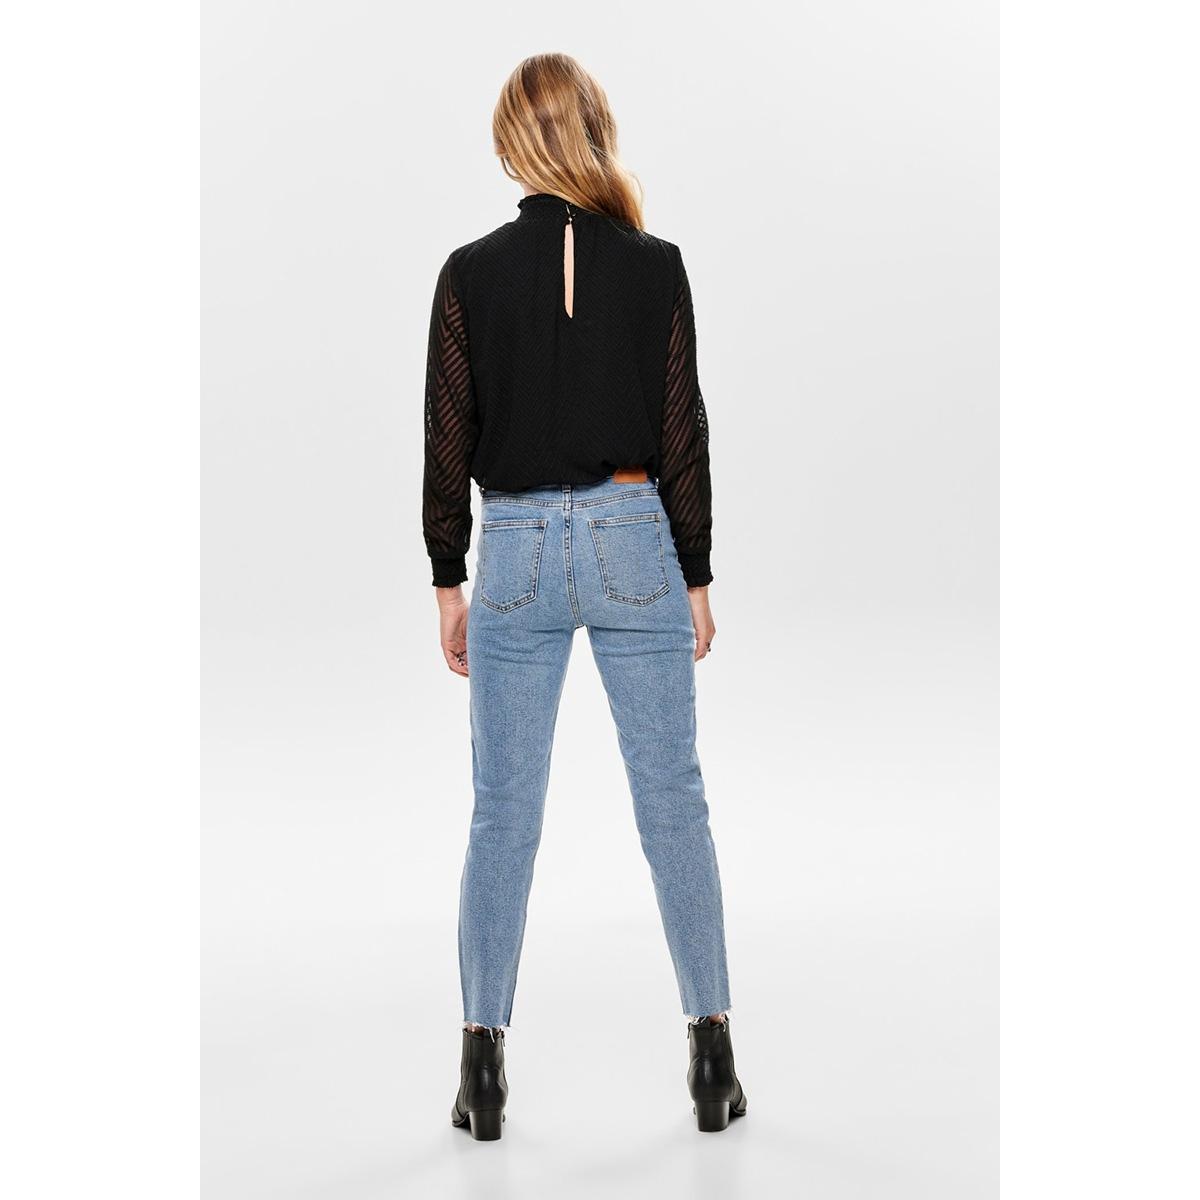 onlnew kayla l/s top noos wvn 15190950 only blouse black